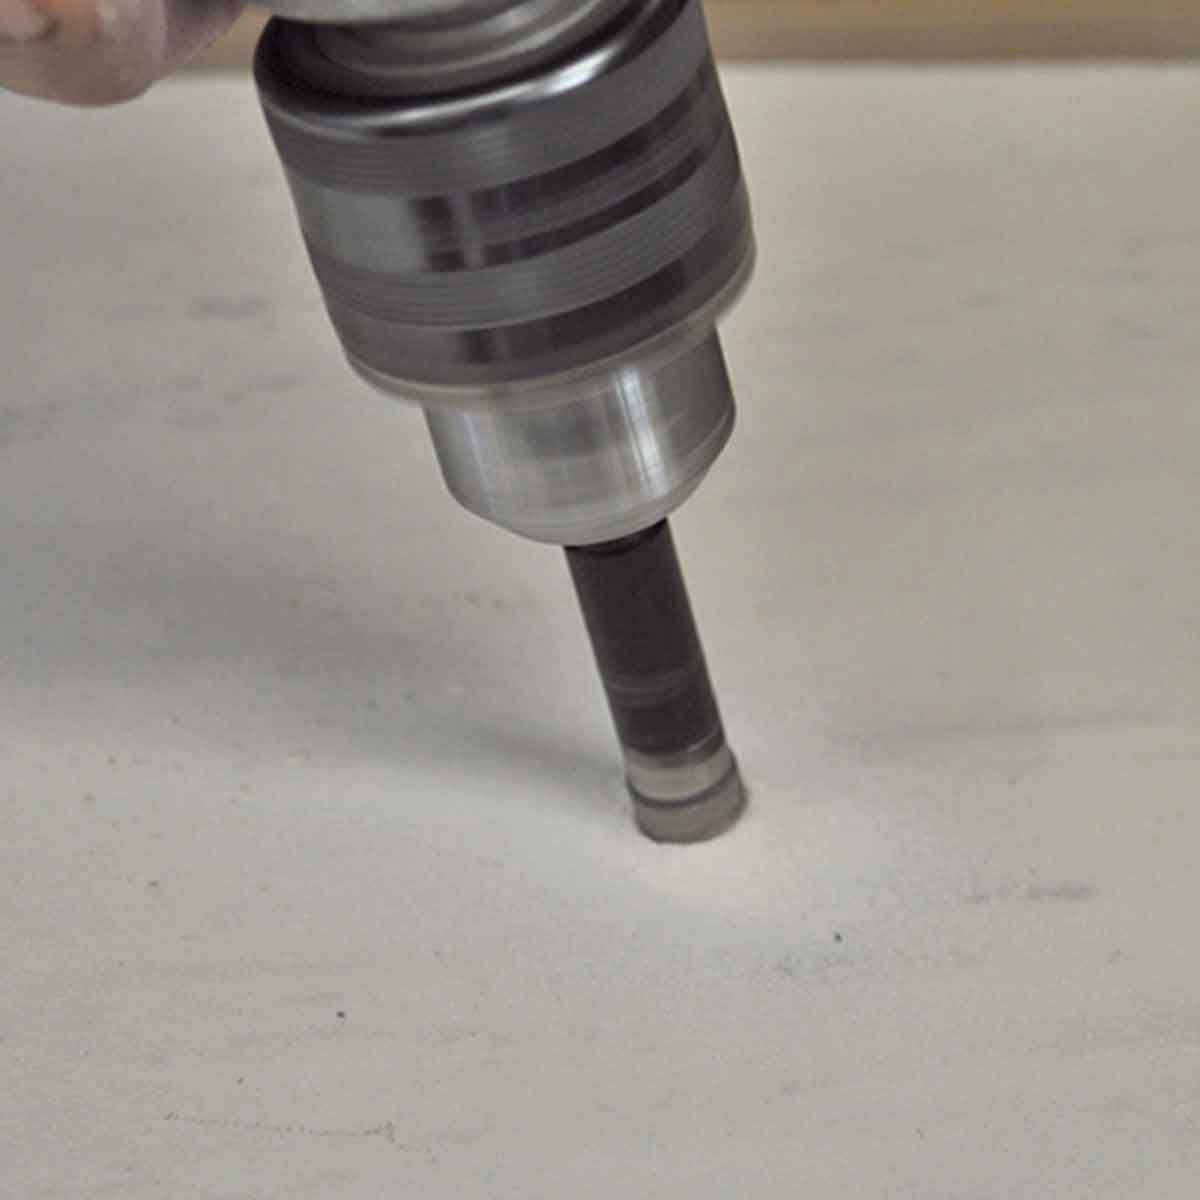 Montolit FAJ05 Mondrillo 5 mm Diamond Drill Bit